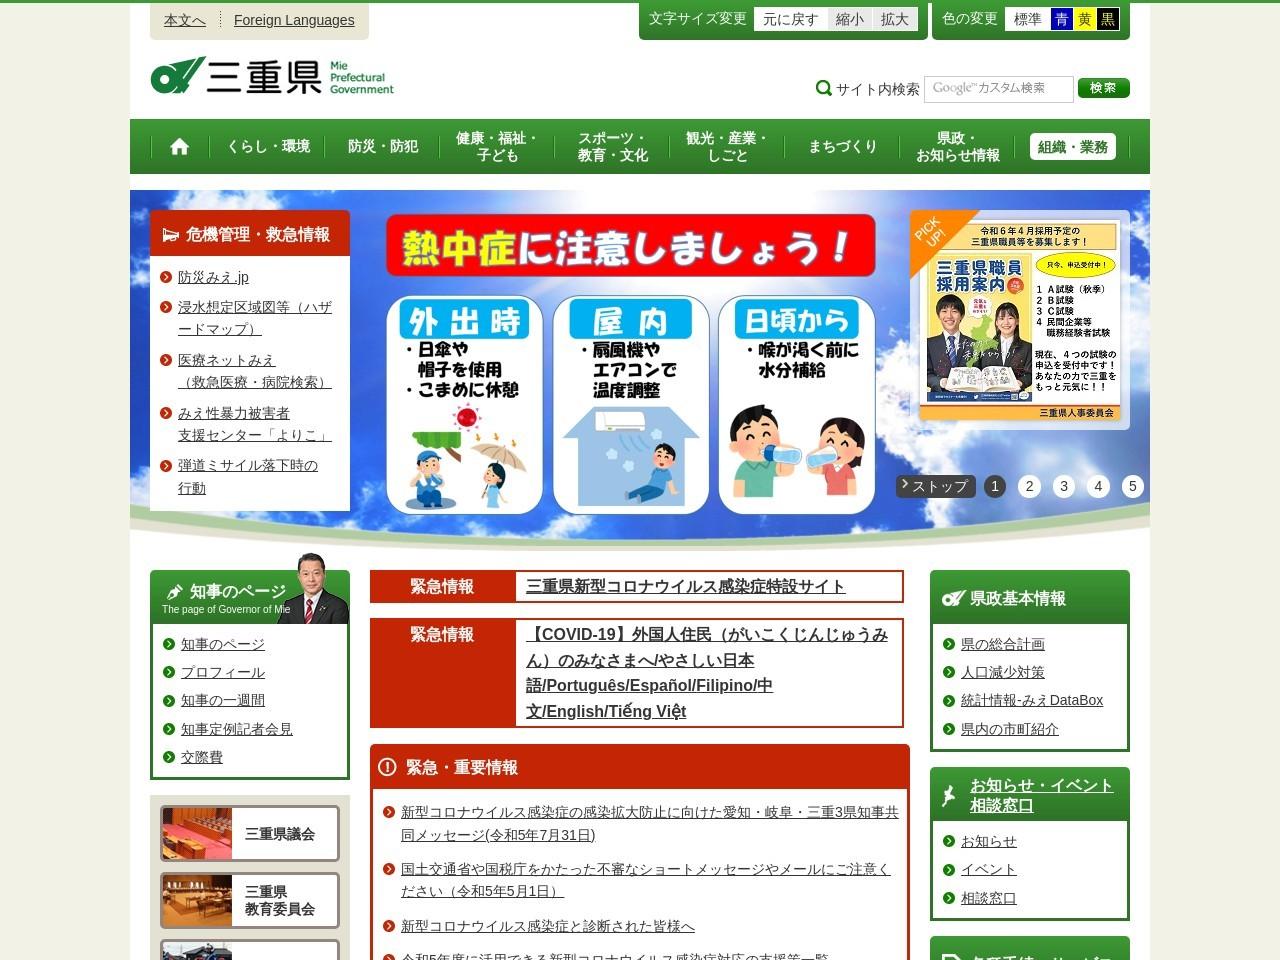 http://www.pref.mie.lg.jp/CHISANM/HP/foodinnovation/project/teirinmai.htm